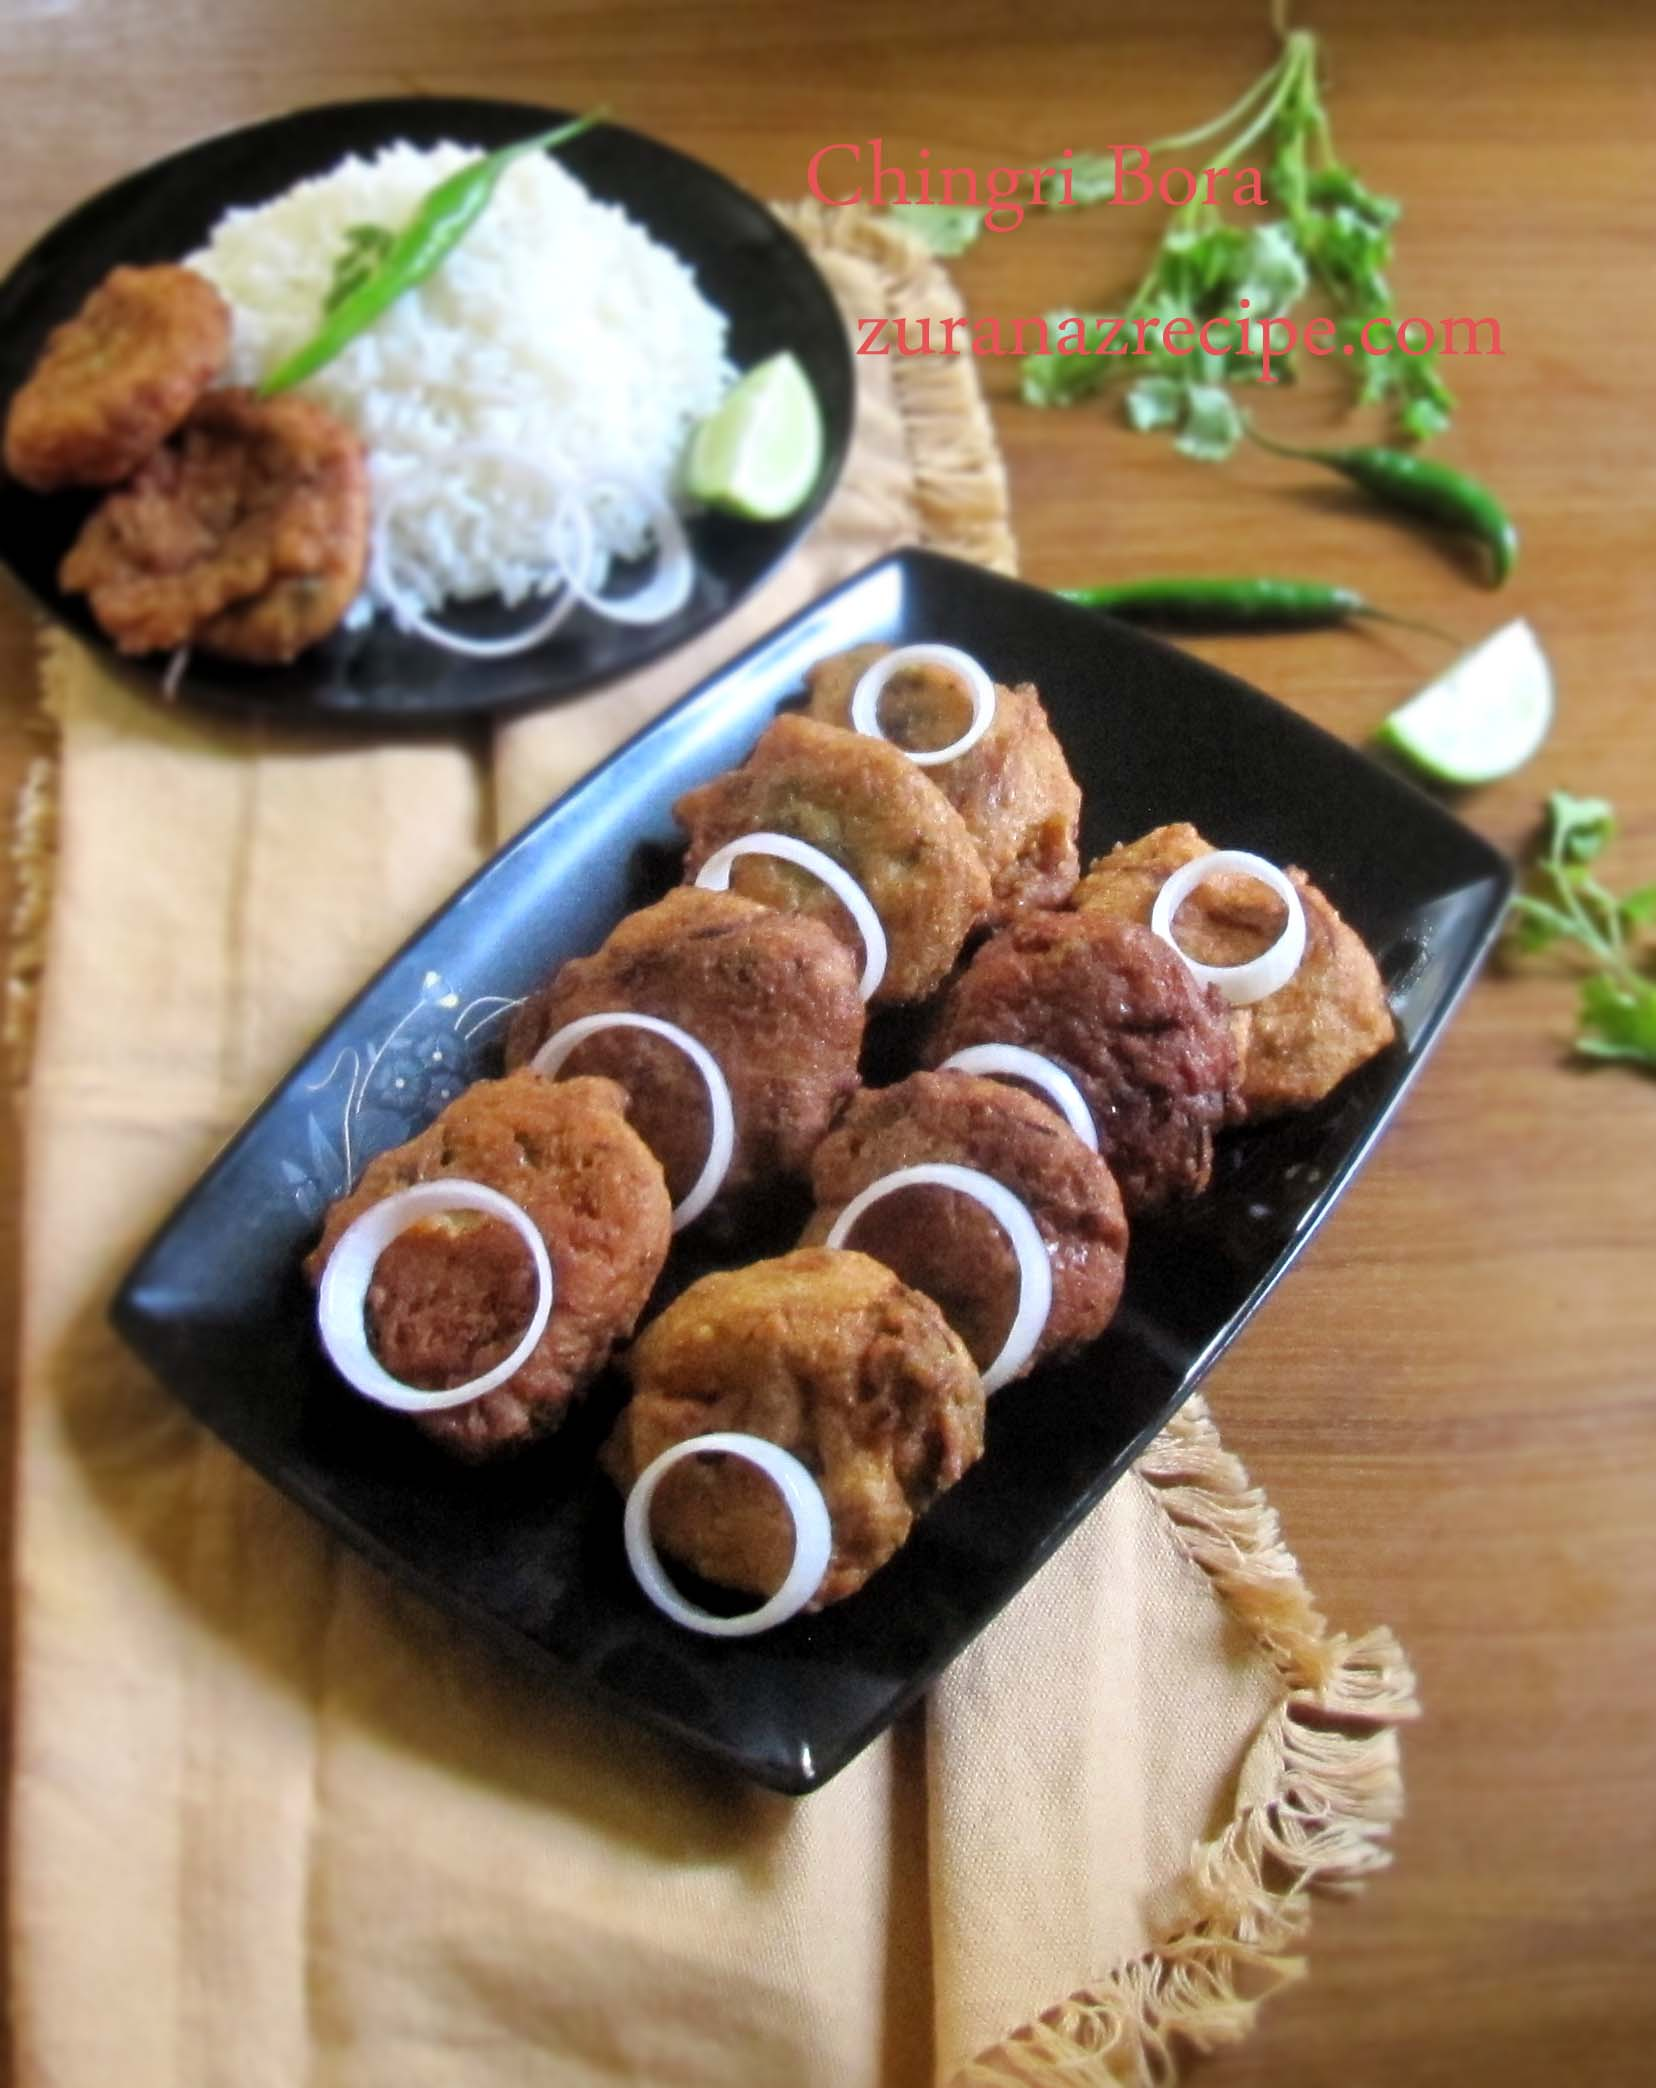 Chingri Bora-Prawn Fritters